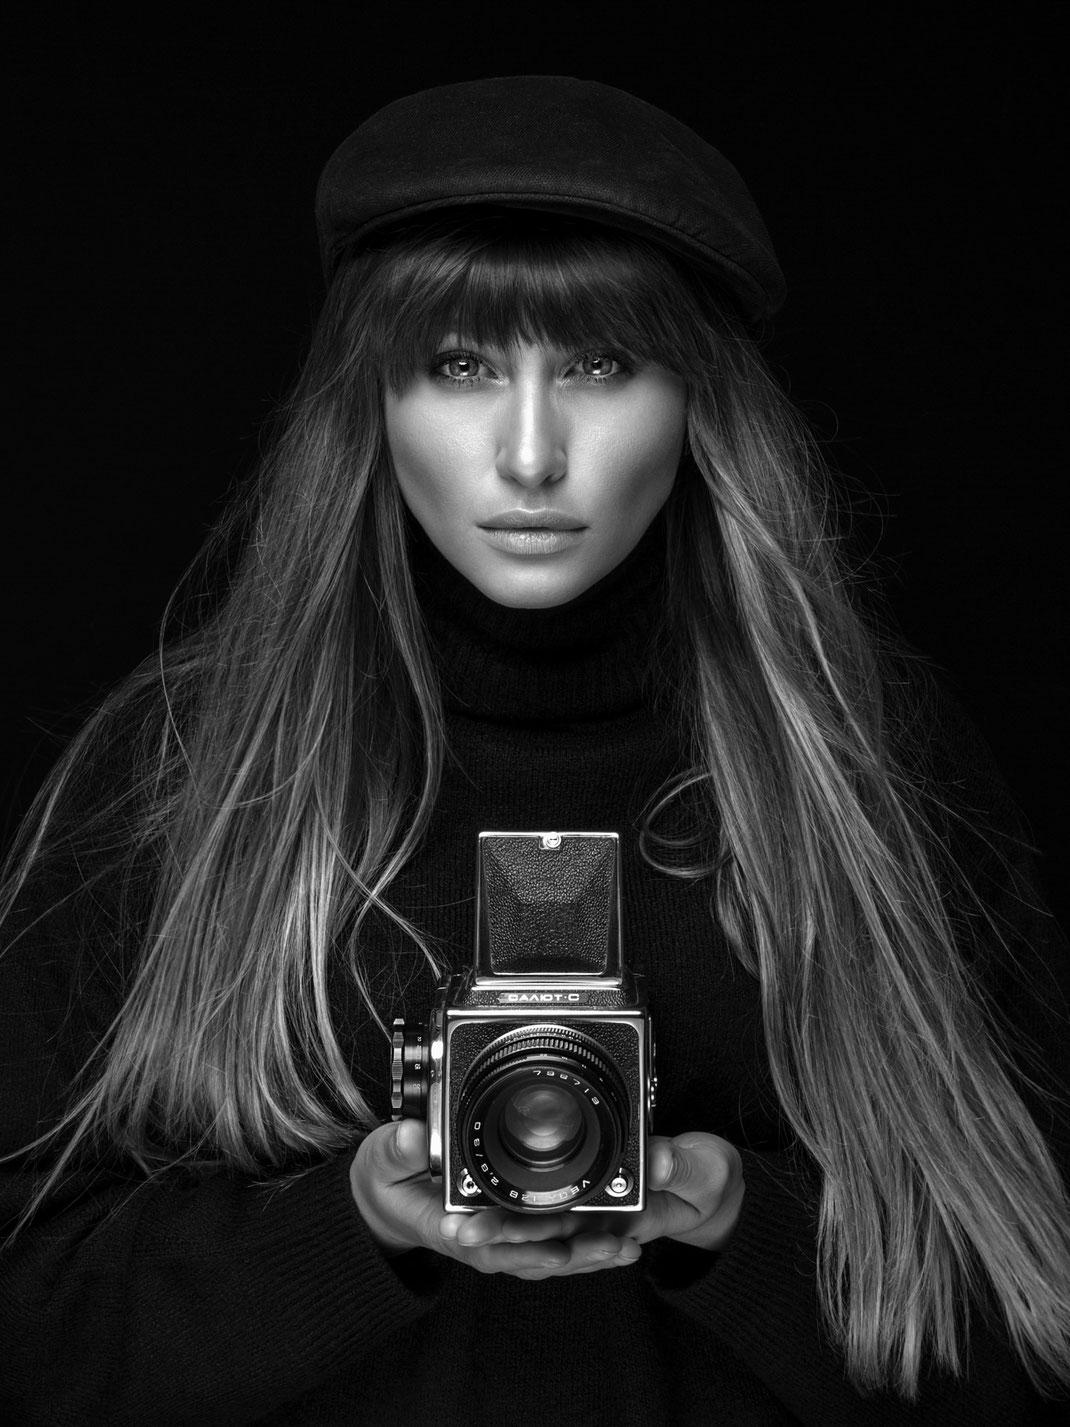 Two Beauties - Kristina & Salyut-S - Markus Hertzsch - Camera - Girl